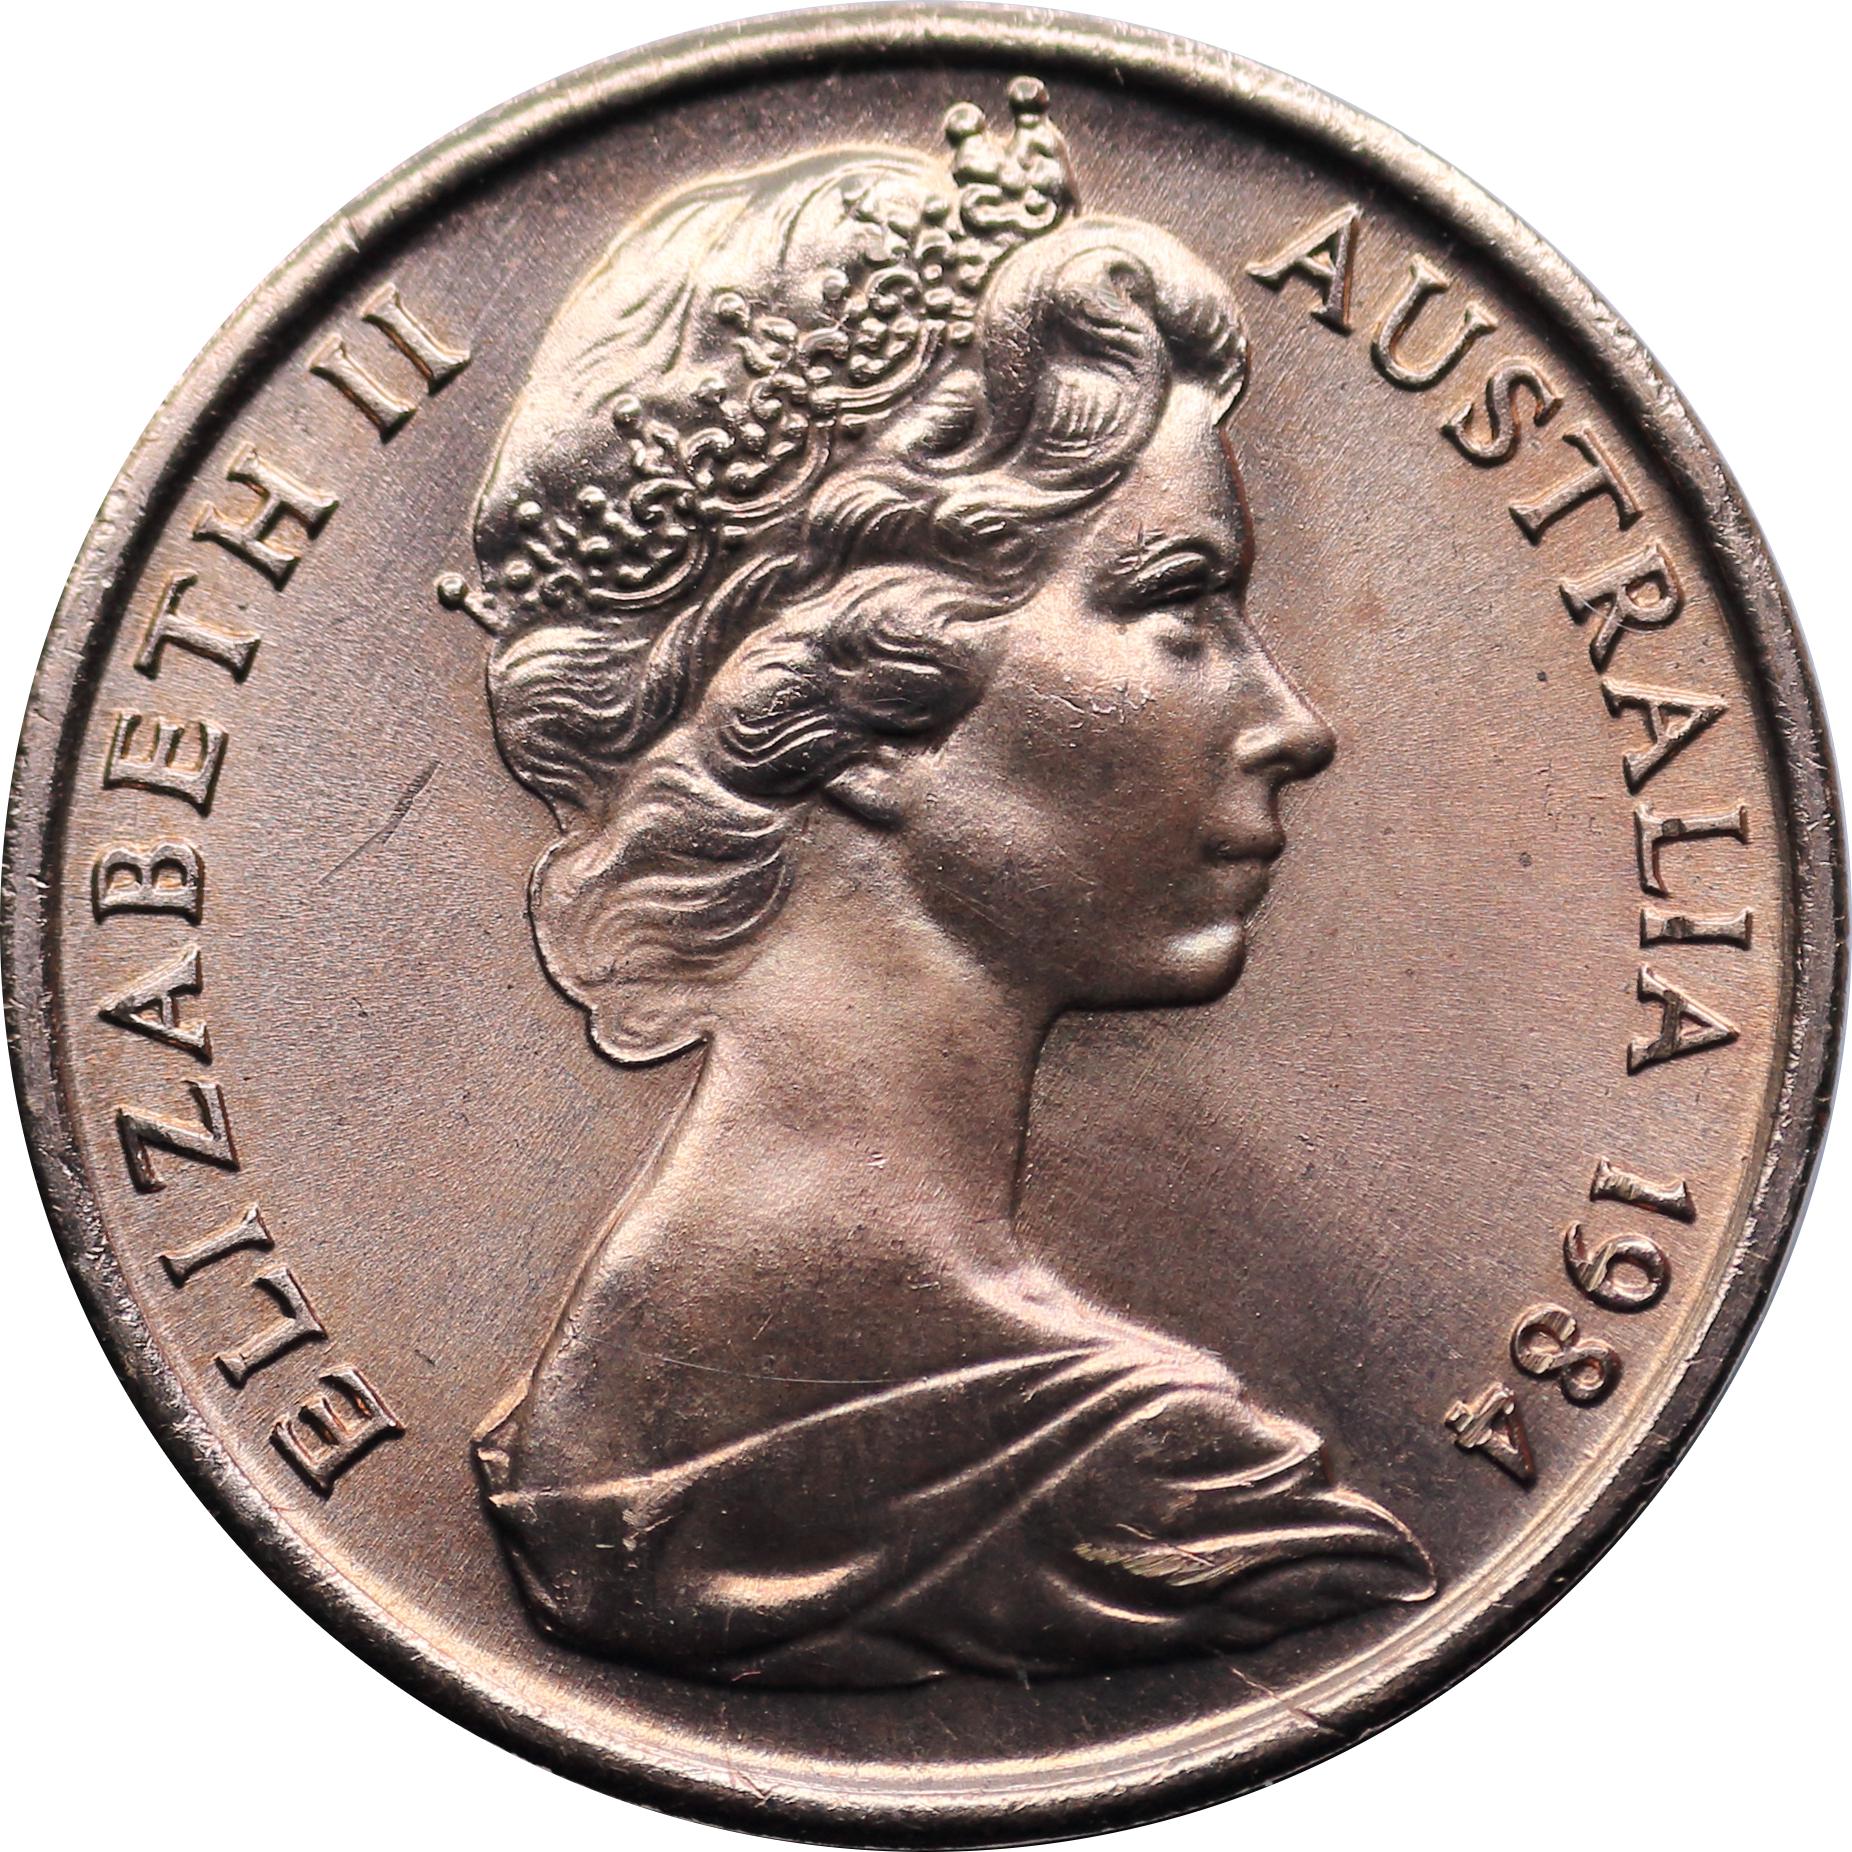 1 Cent - Elizabeth II (2nd portrait) - Australia – Numista